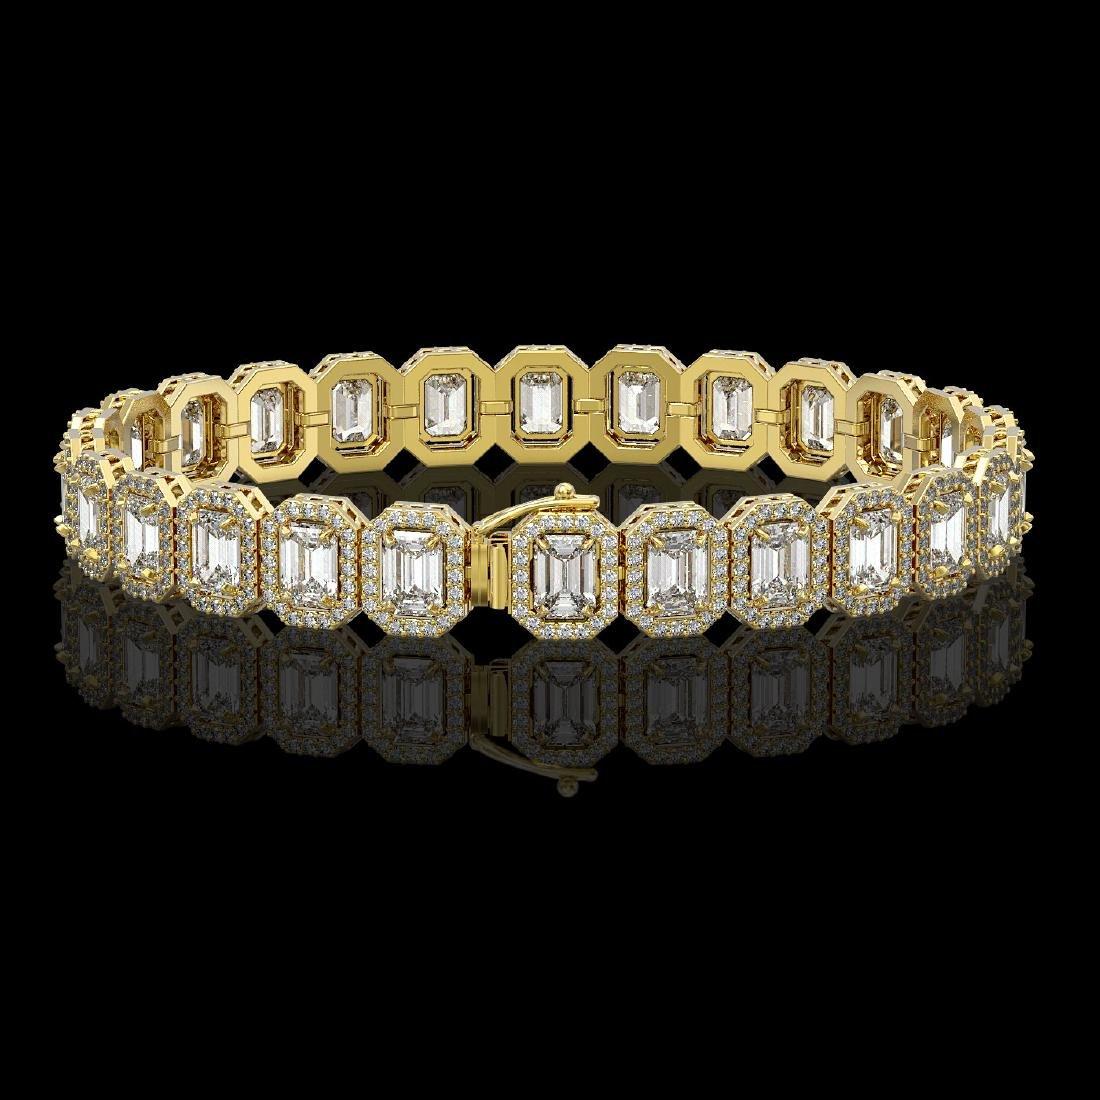 17.28 CTW Emerald Cut Diamond Designer Bracelet 18K - 2